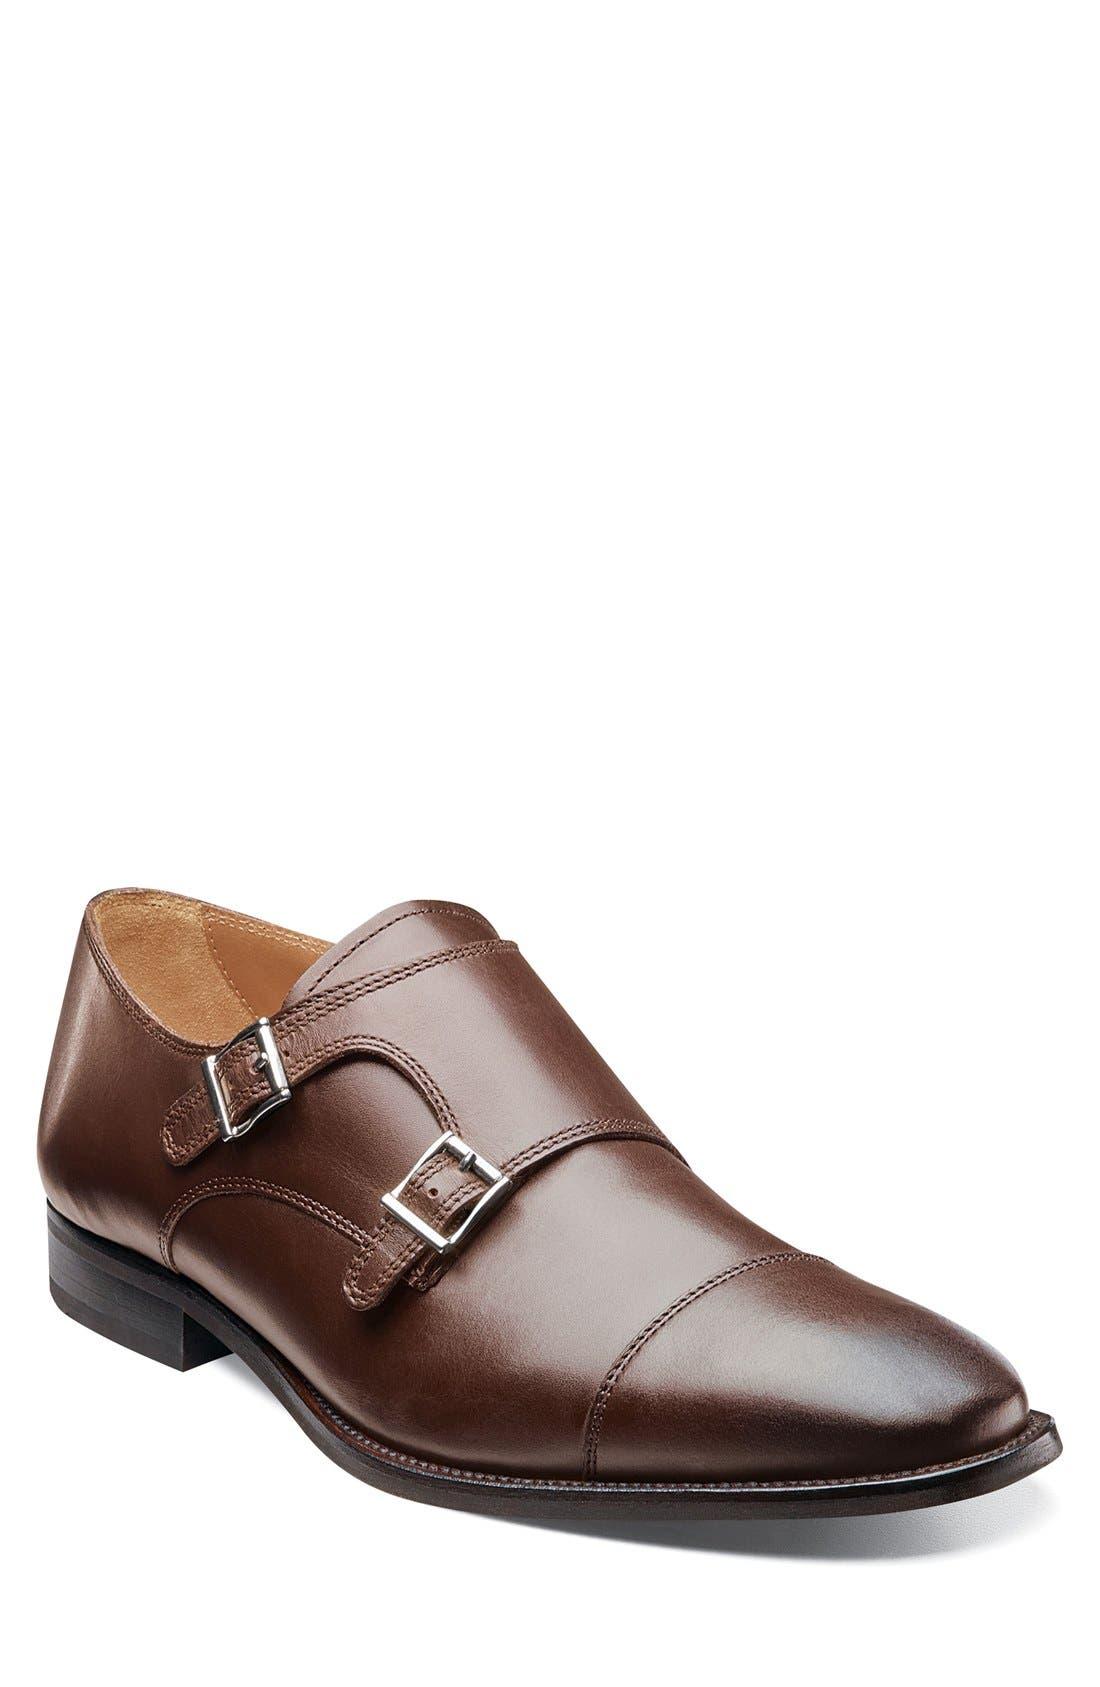 FLORSHEIM Sabato Double Monk Strap Shoe